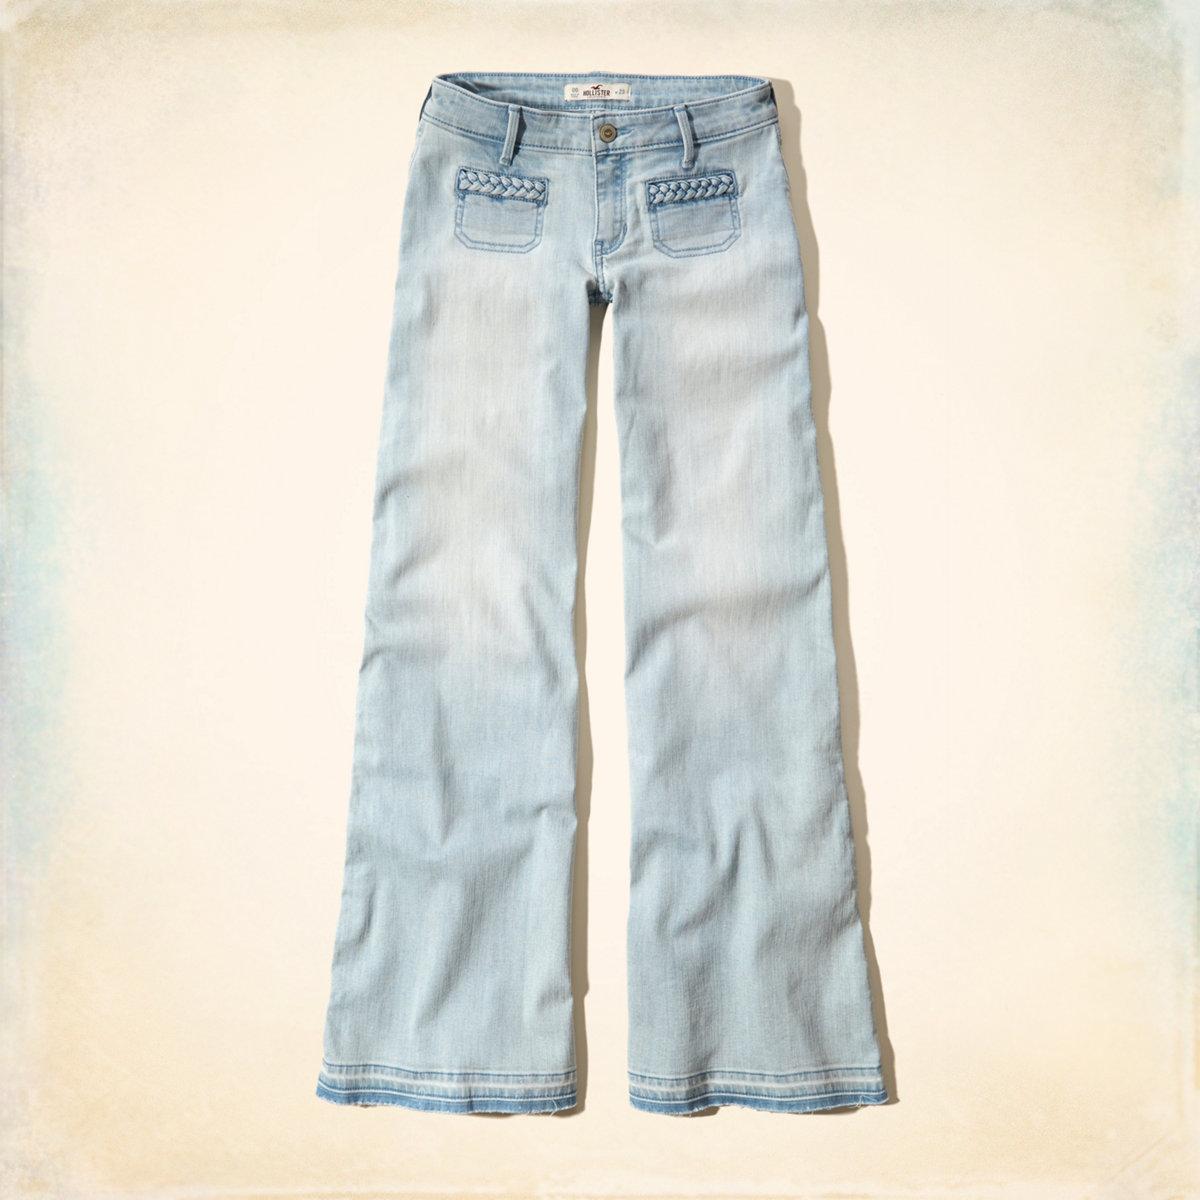 Hollister Wide Leg Flare Jeans